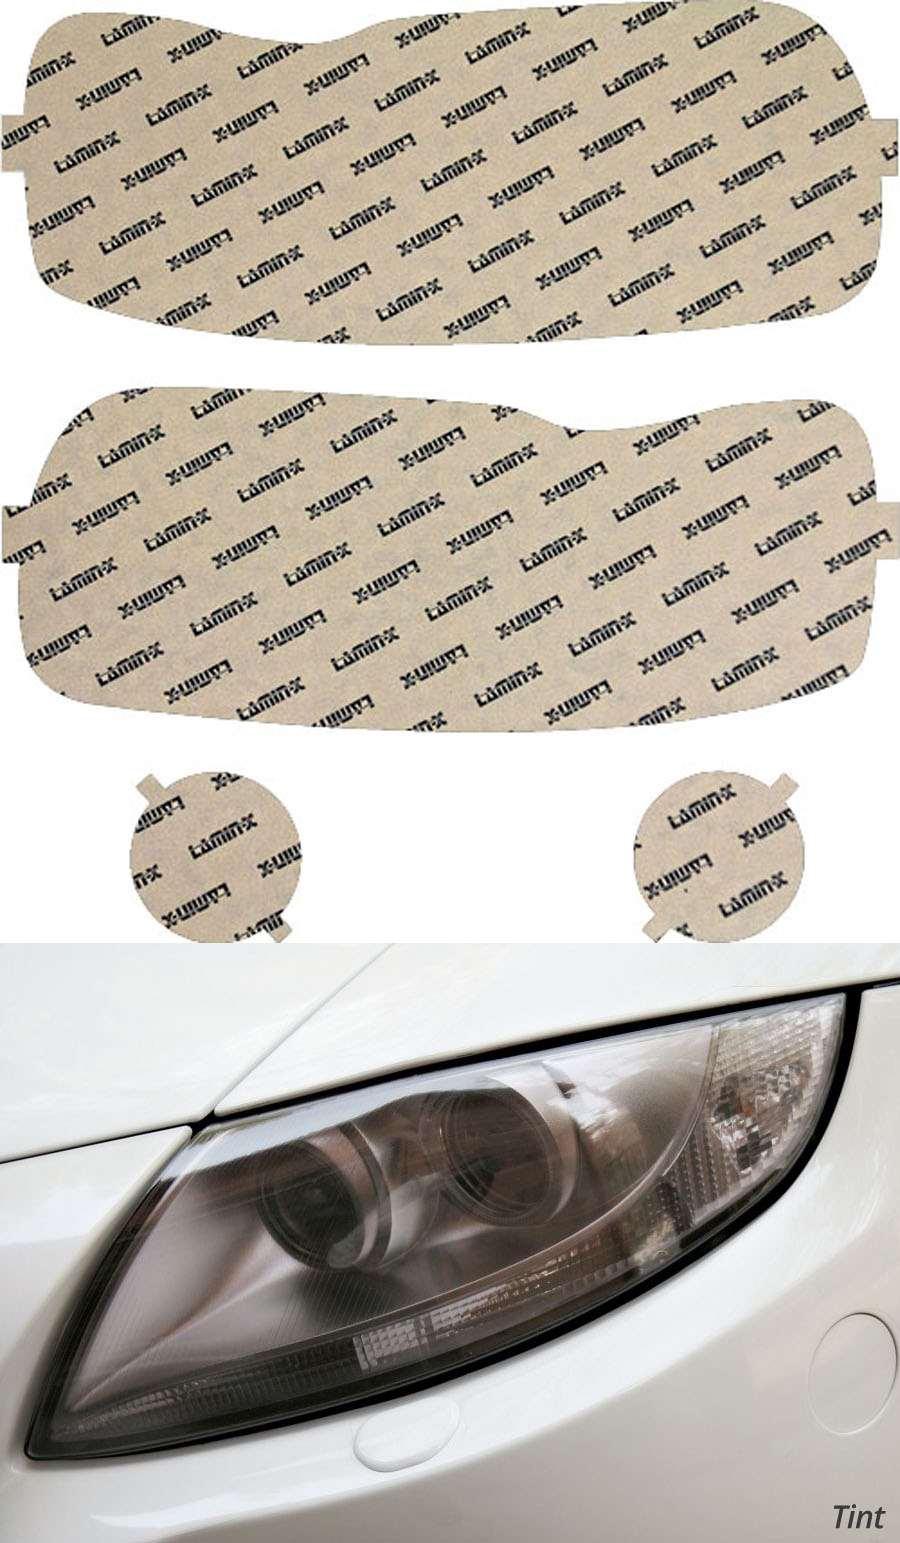 Ford Escape 05-07 Tint Headlight Covers Lamin-X F505T